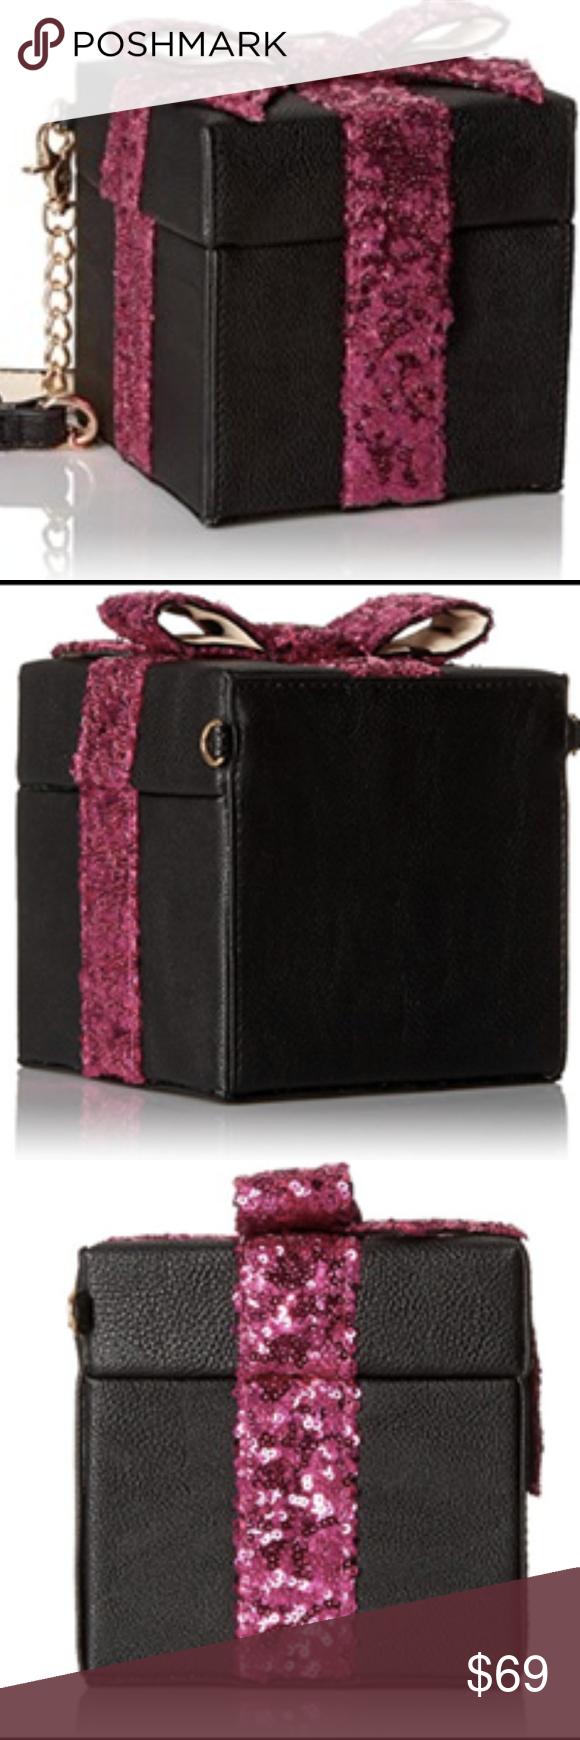 Jual River Island Pink Glitter Mini Cross Body Bag In Lyst Womenamp039s Retro 3 4 Sleeve Denim Slim Bubble T Shirt Dress Thats A Wrap Gift Box Black Sequin Handbag Nwt